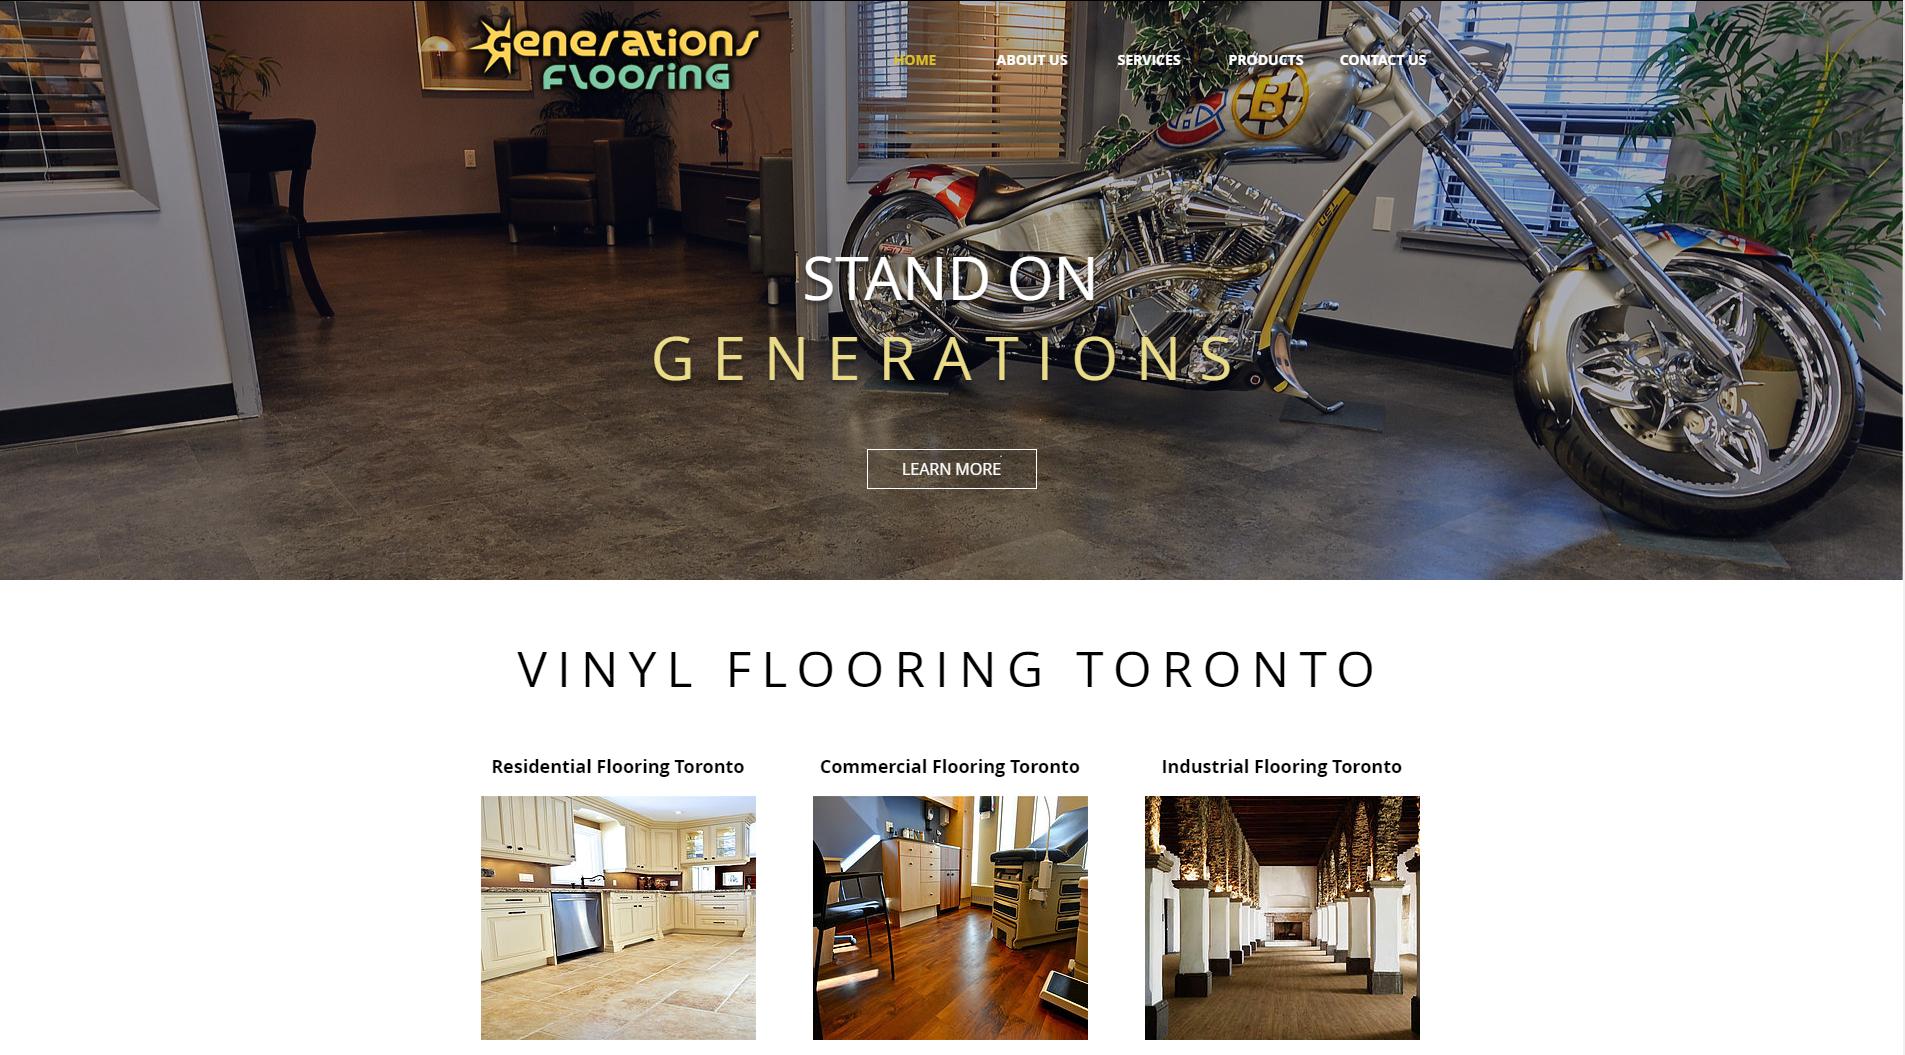 Generations Flooring